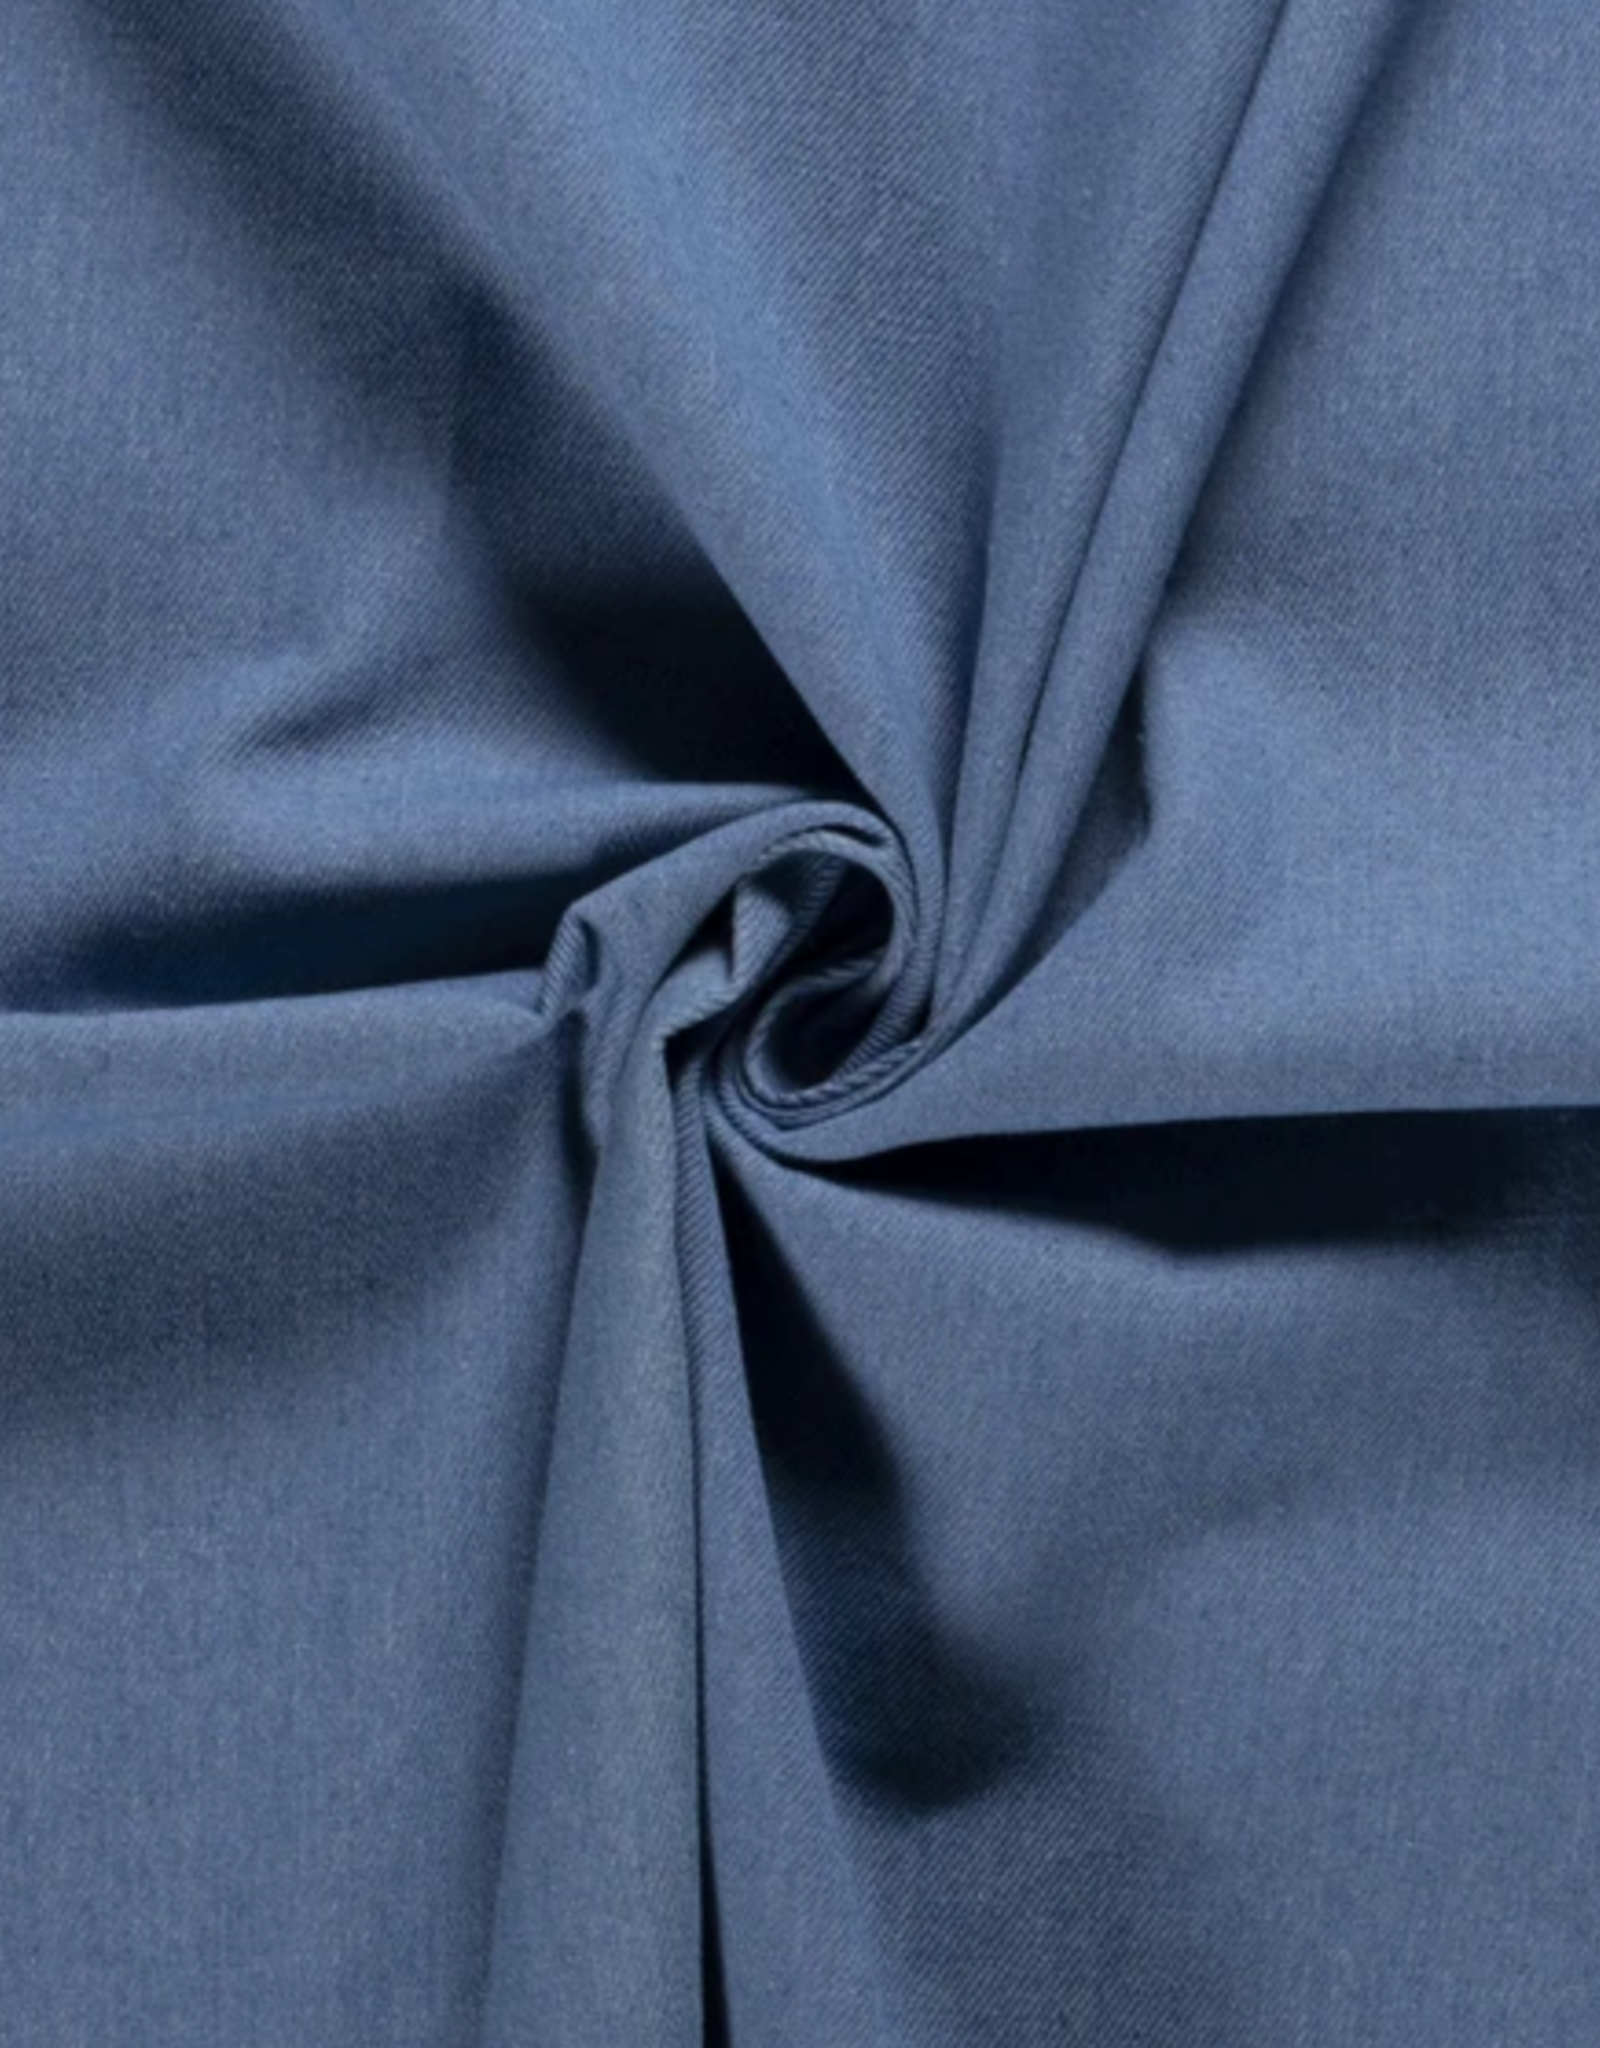 Heavy Denim - Baby Blue